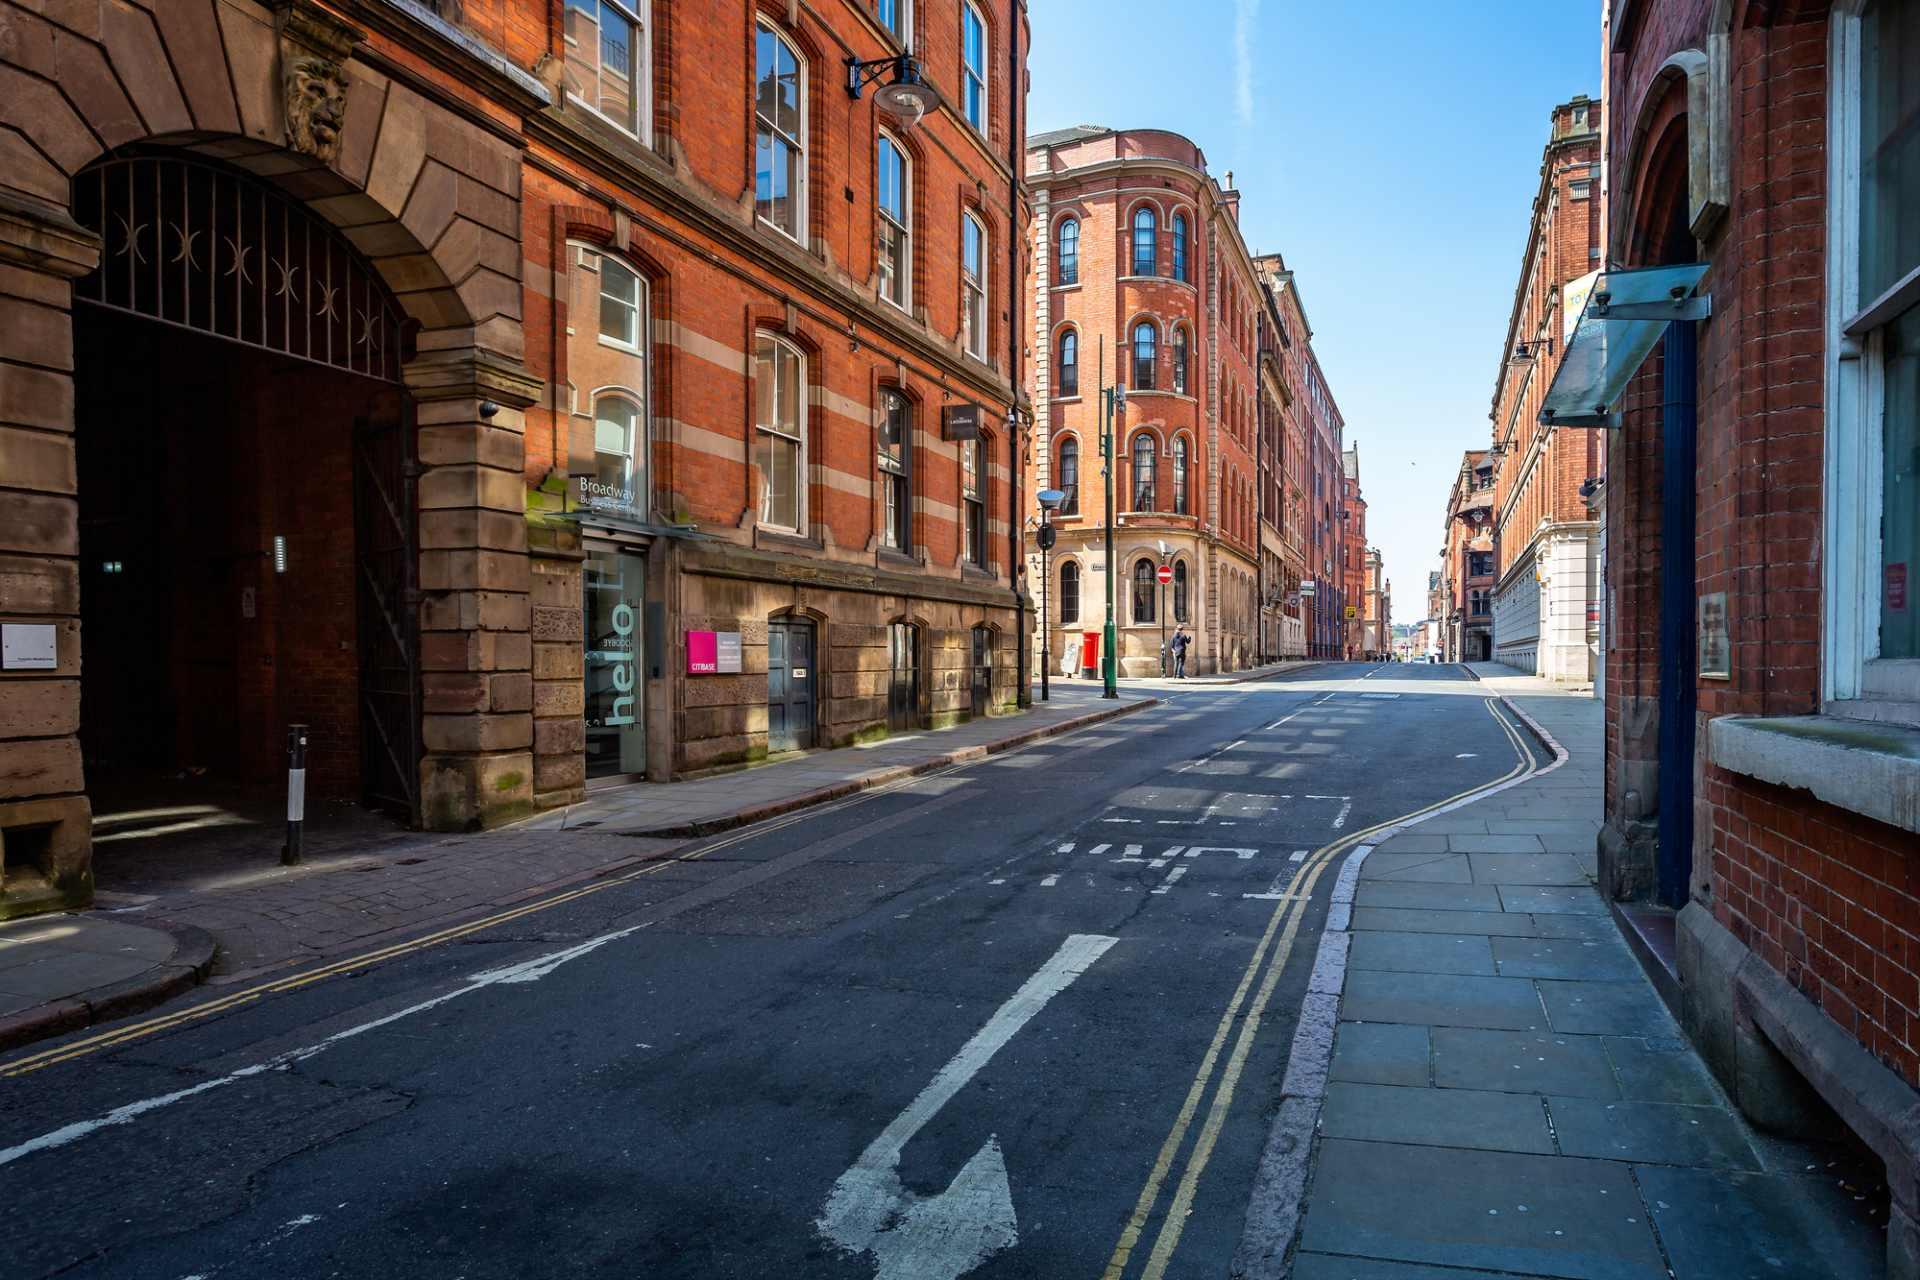 city-centre-street-with-orange-buildings-the-lace-market